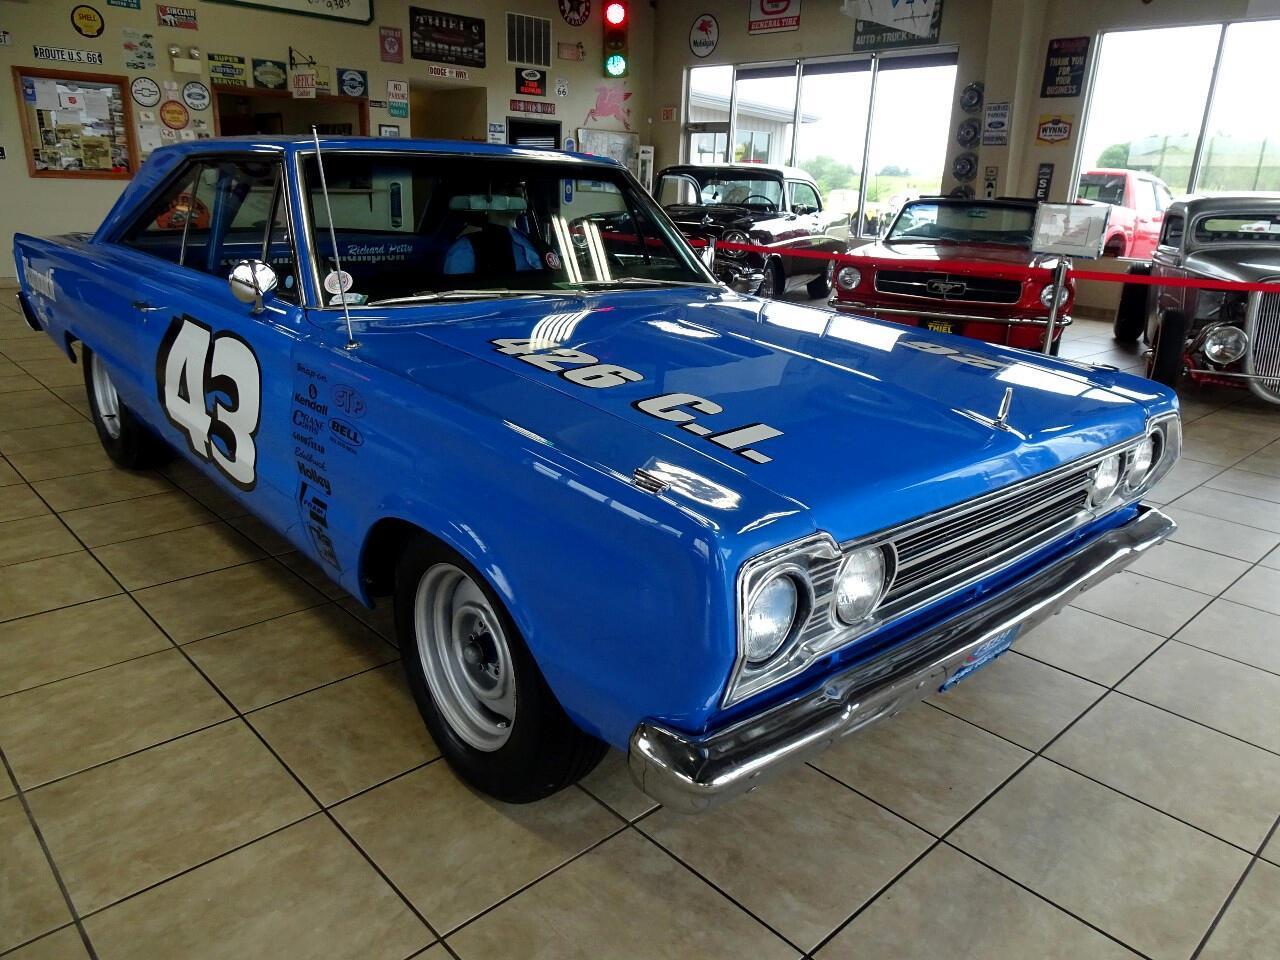 1967 Plymouth Belvedere (CC-1216361) for sale in De Witt, Iowa